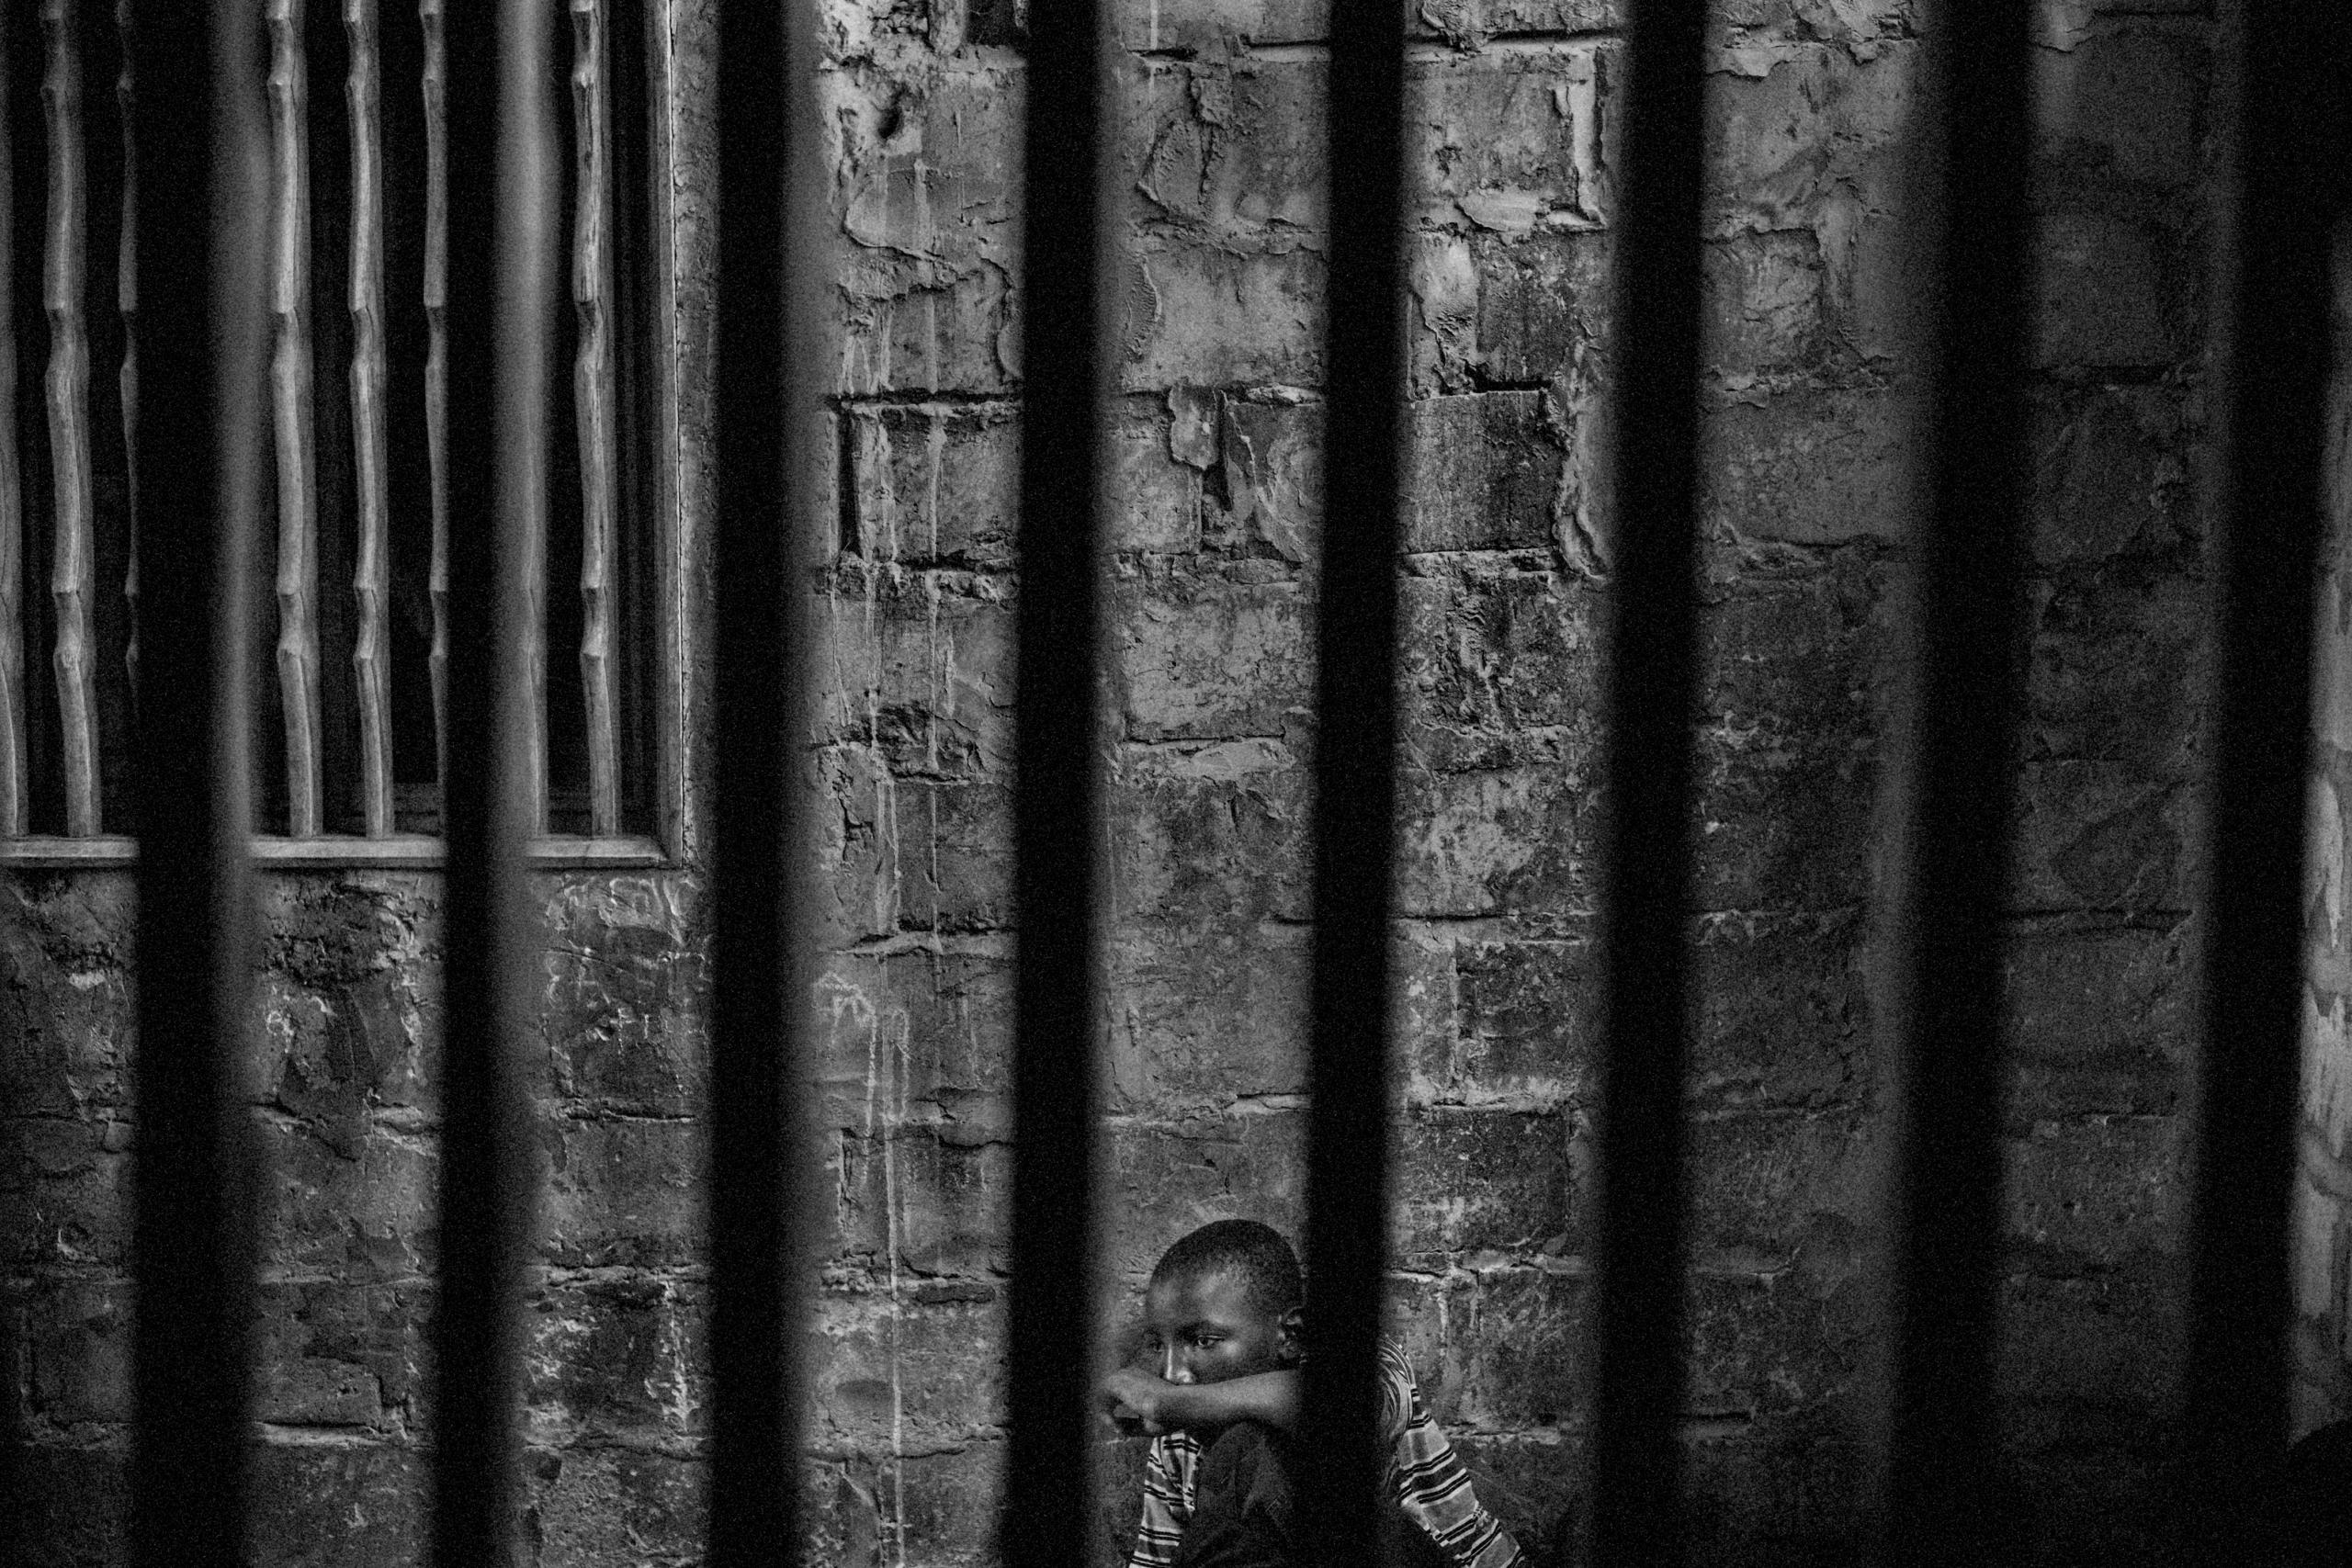 World Press Photo 2016 - Talibes-Modern-day-Slaves